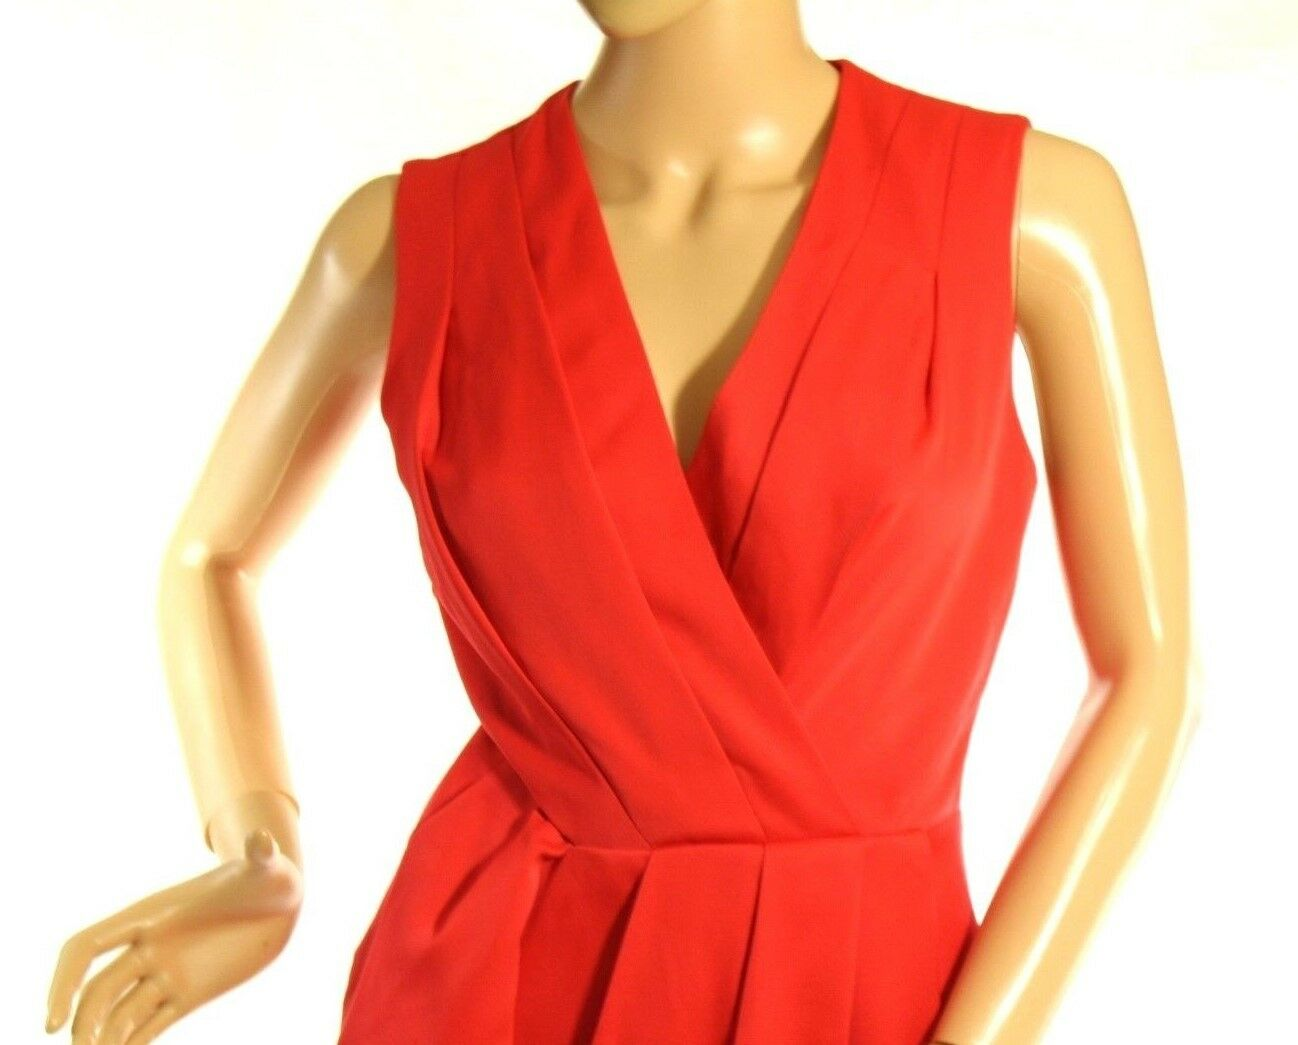 Rachel Roy Women's Red Faux-Wrap Cutout Sleeveless Dress Size 0 Retail